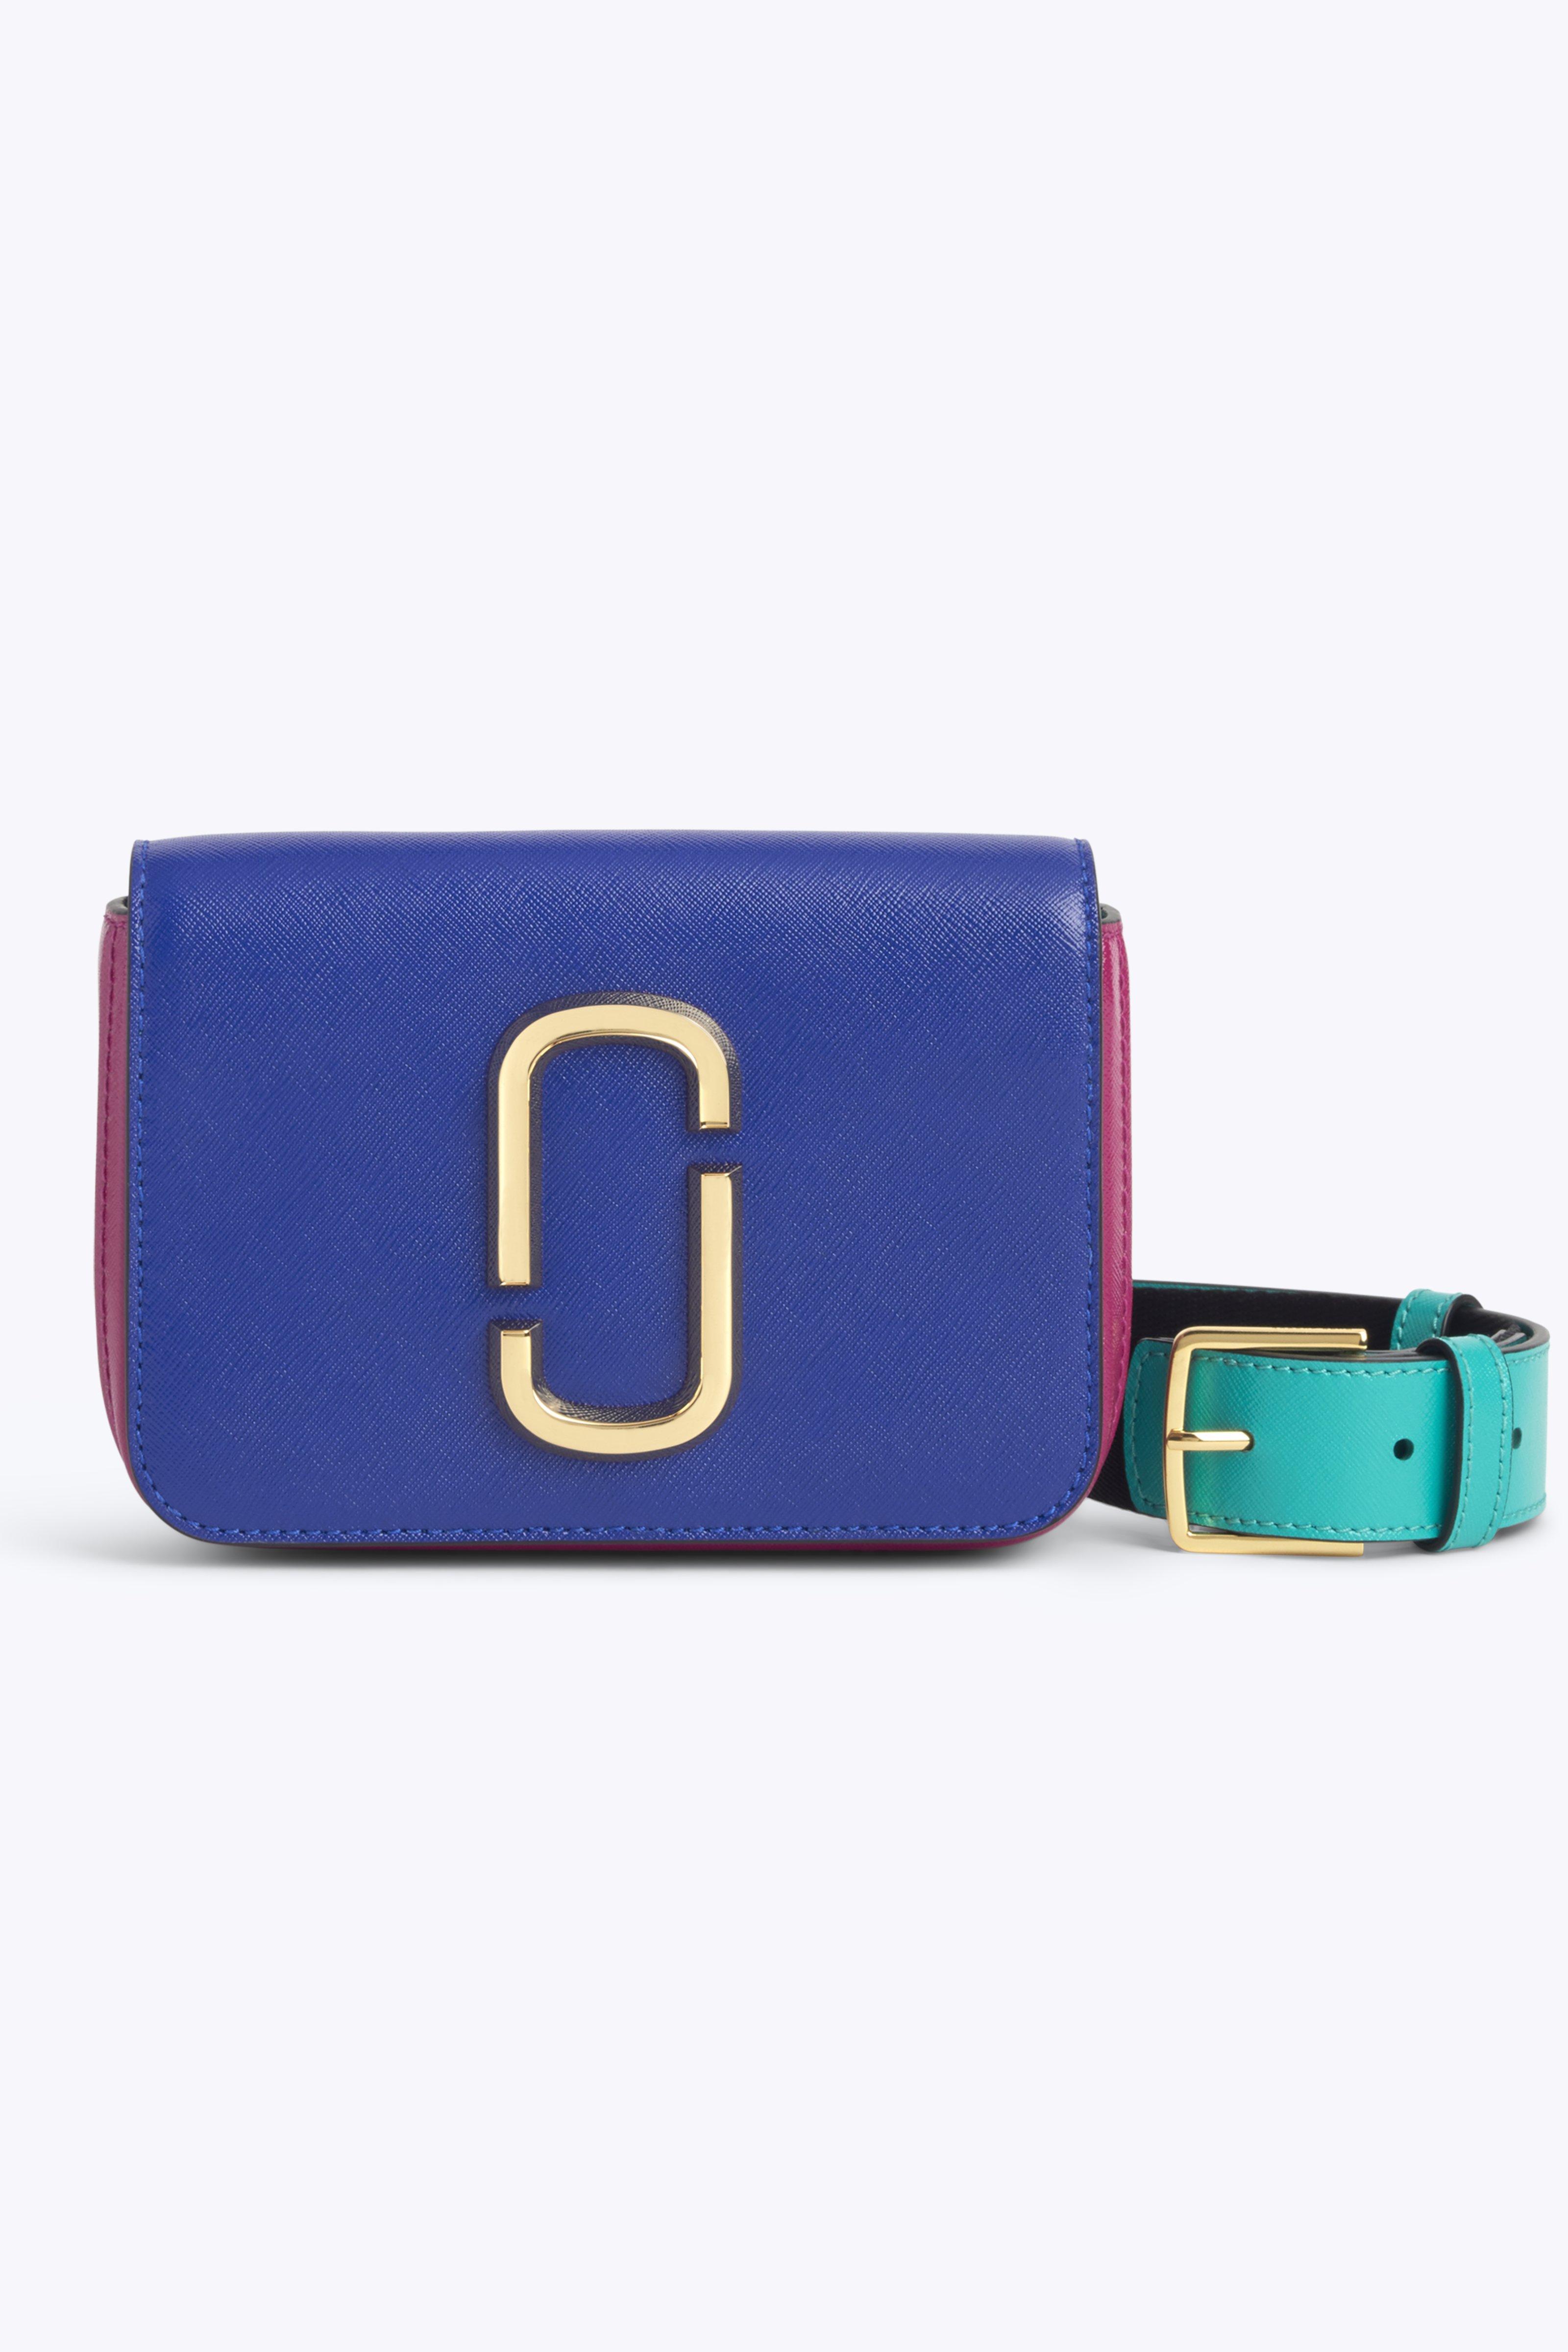 Hip Shot Convertible Crossbody Bag - Blue, Academy Blue Multi